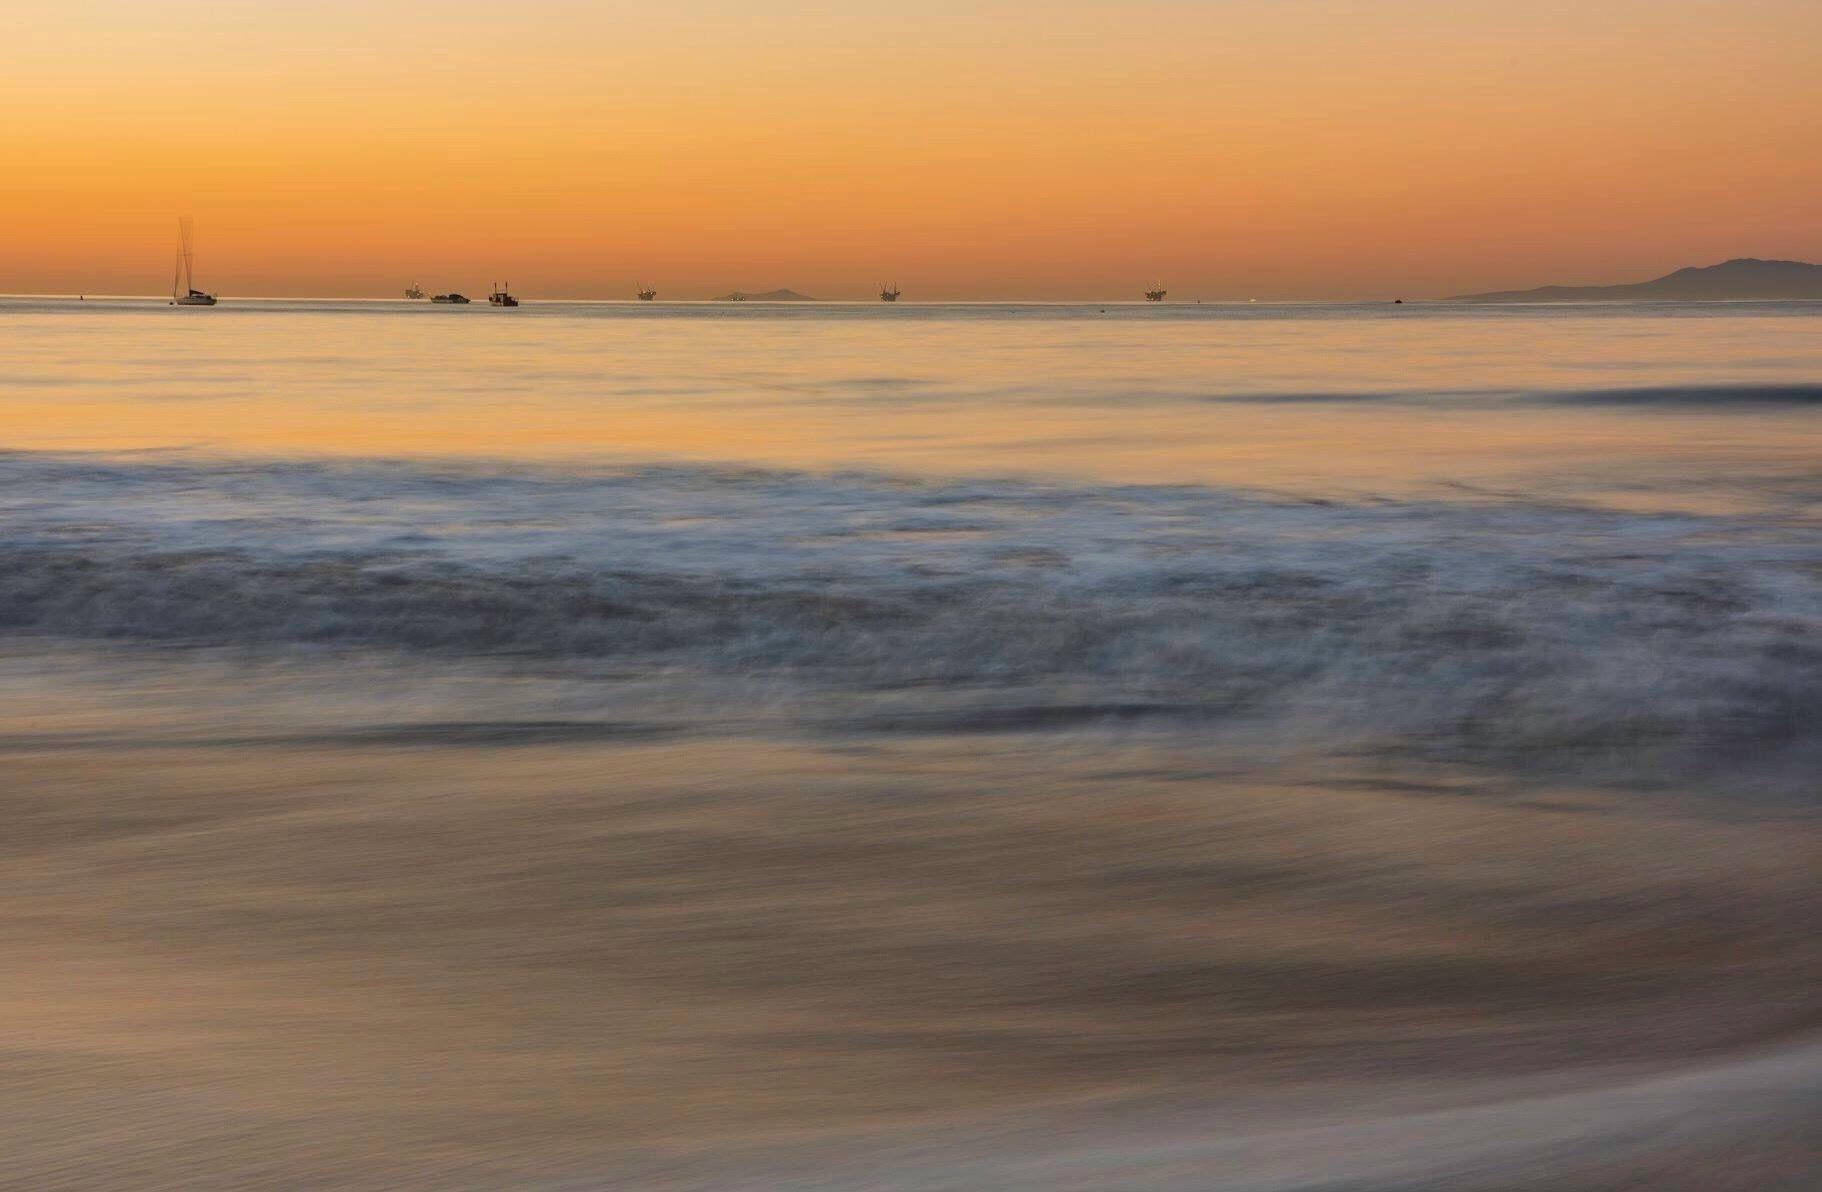 West Beach, Santa Barbara, California, United States of America